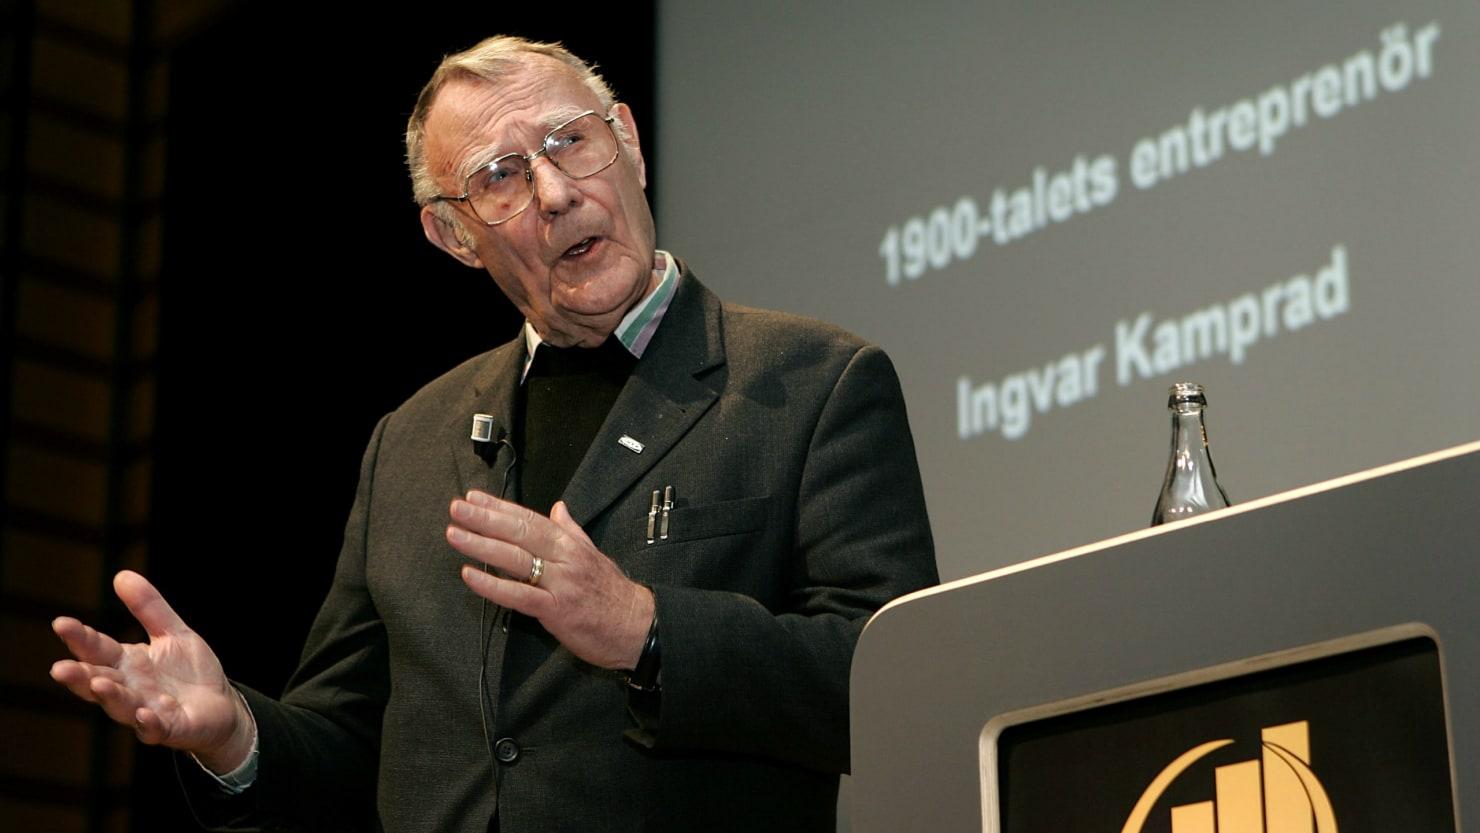 Ikea Founder Ingvar Kamprad Dead At 91